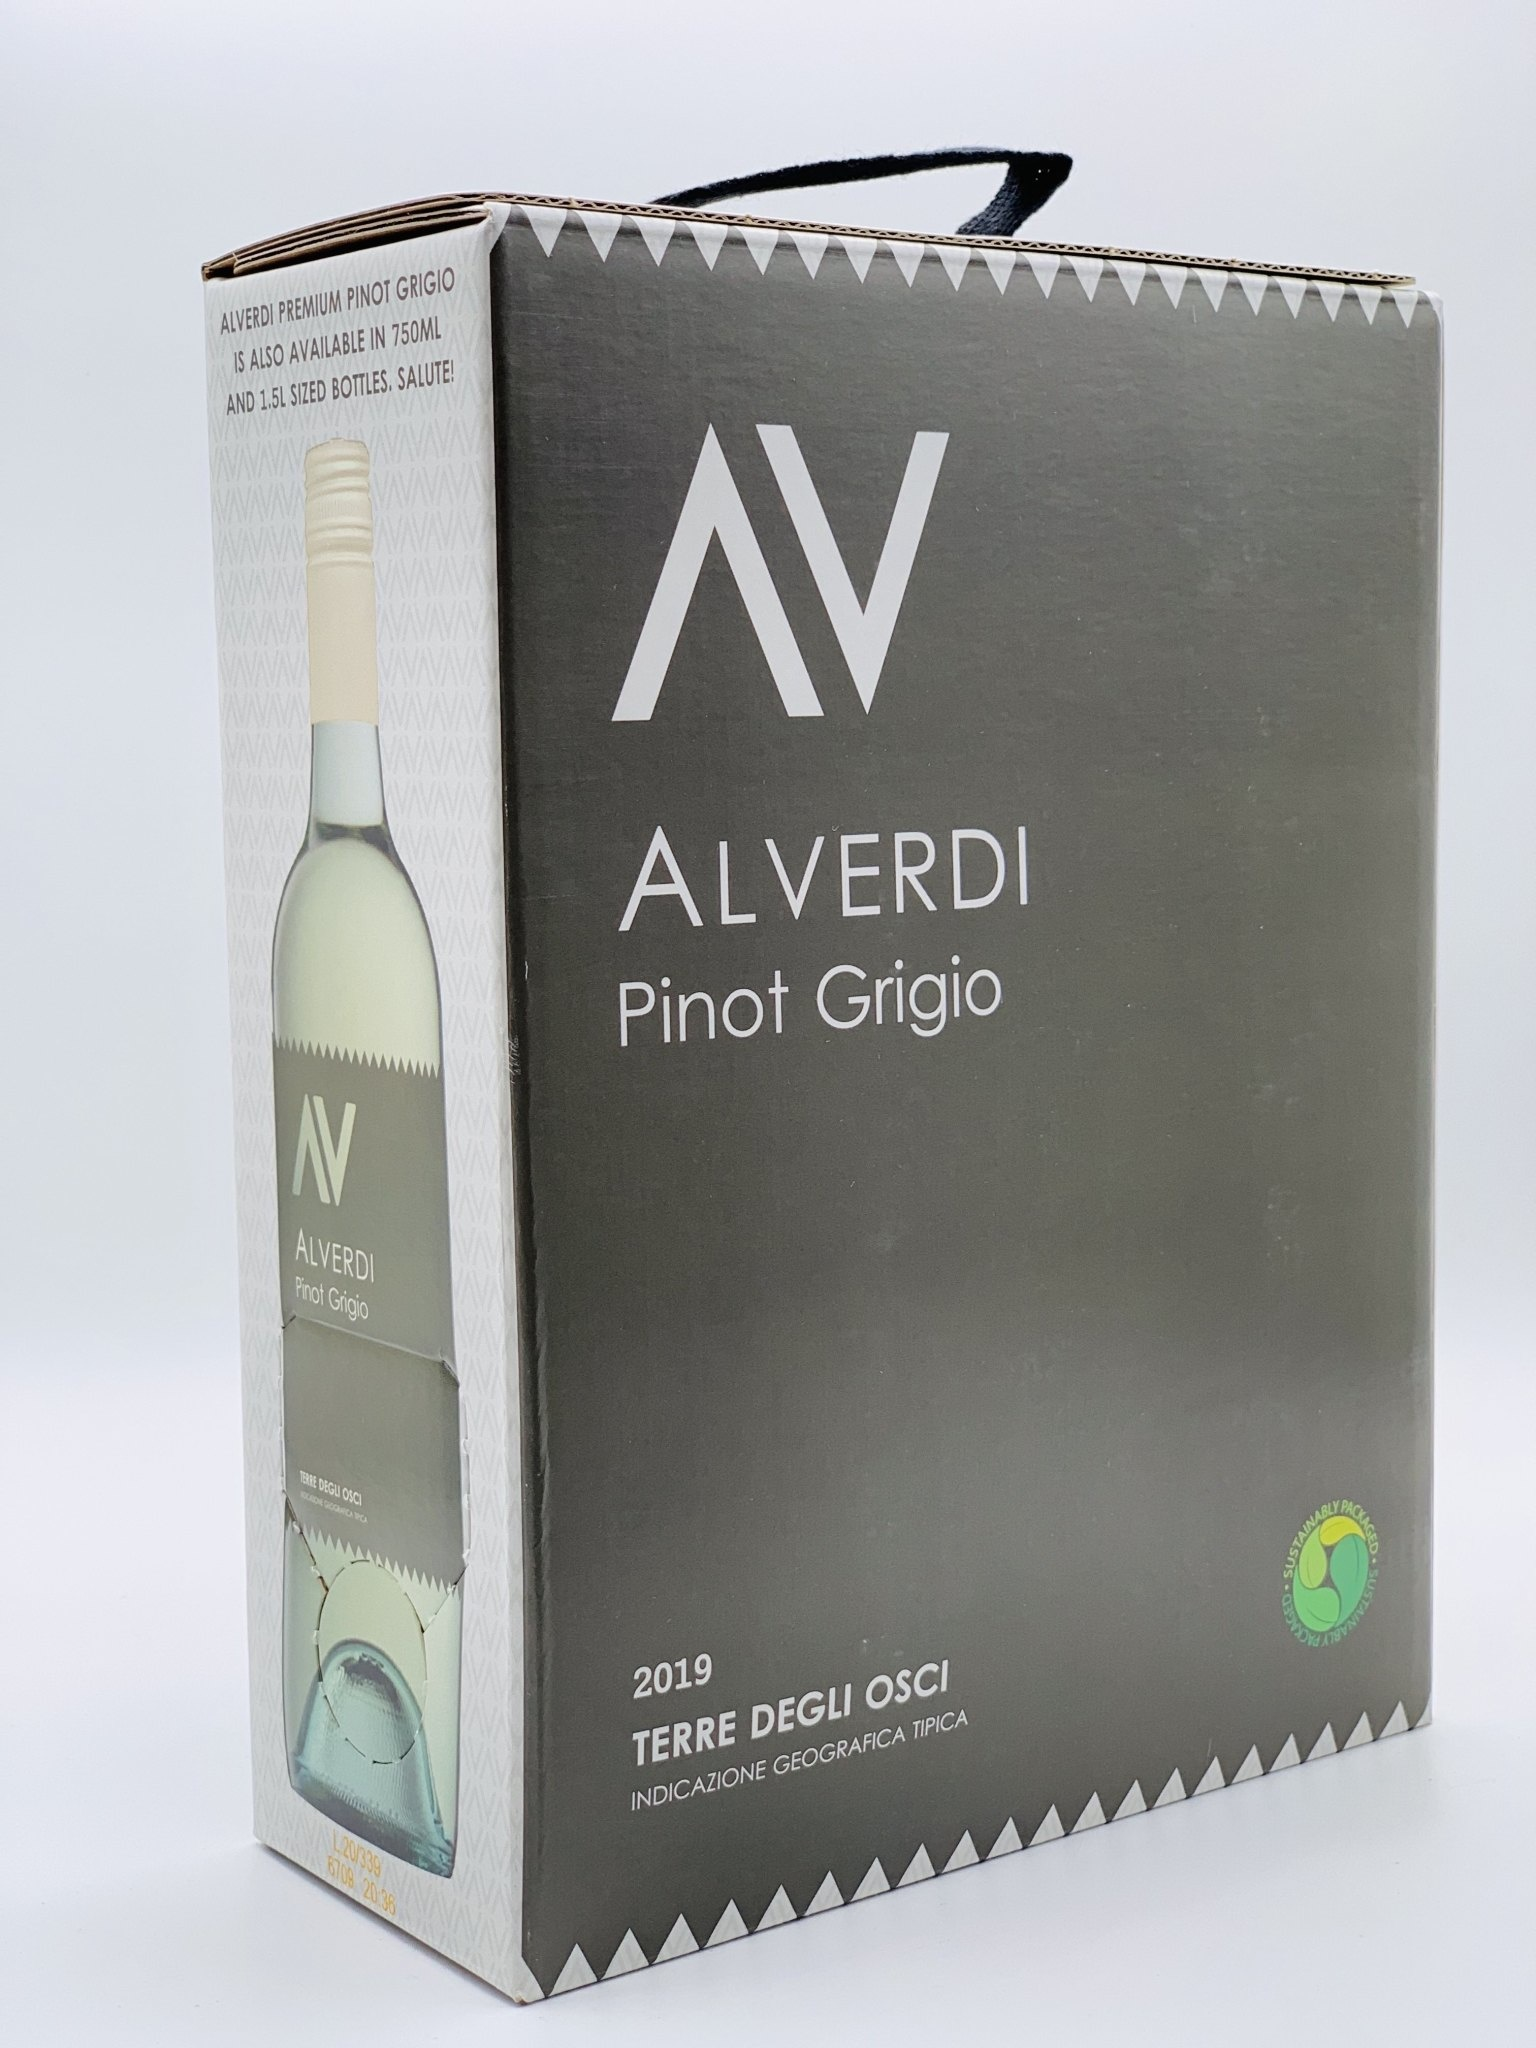 Molise Pinot Grigio 2019 Alverdi 3.0 Liter Box Wine